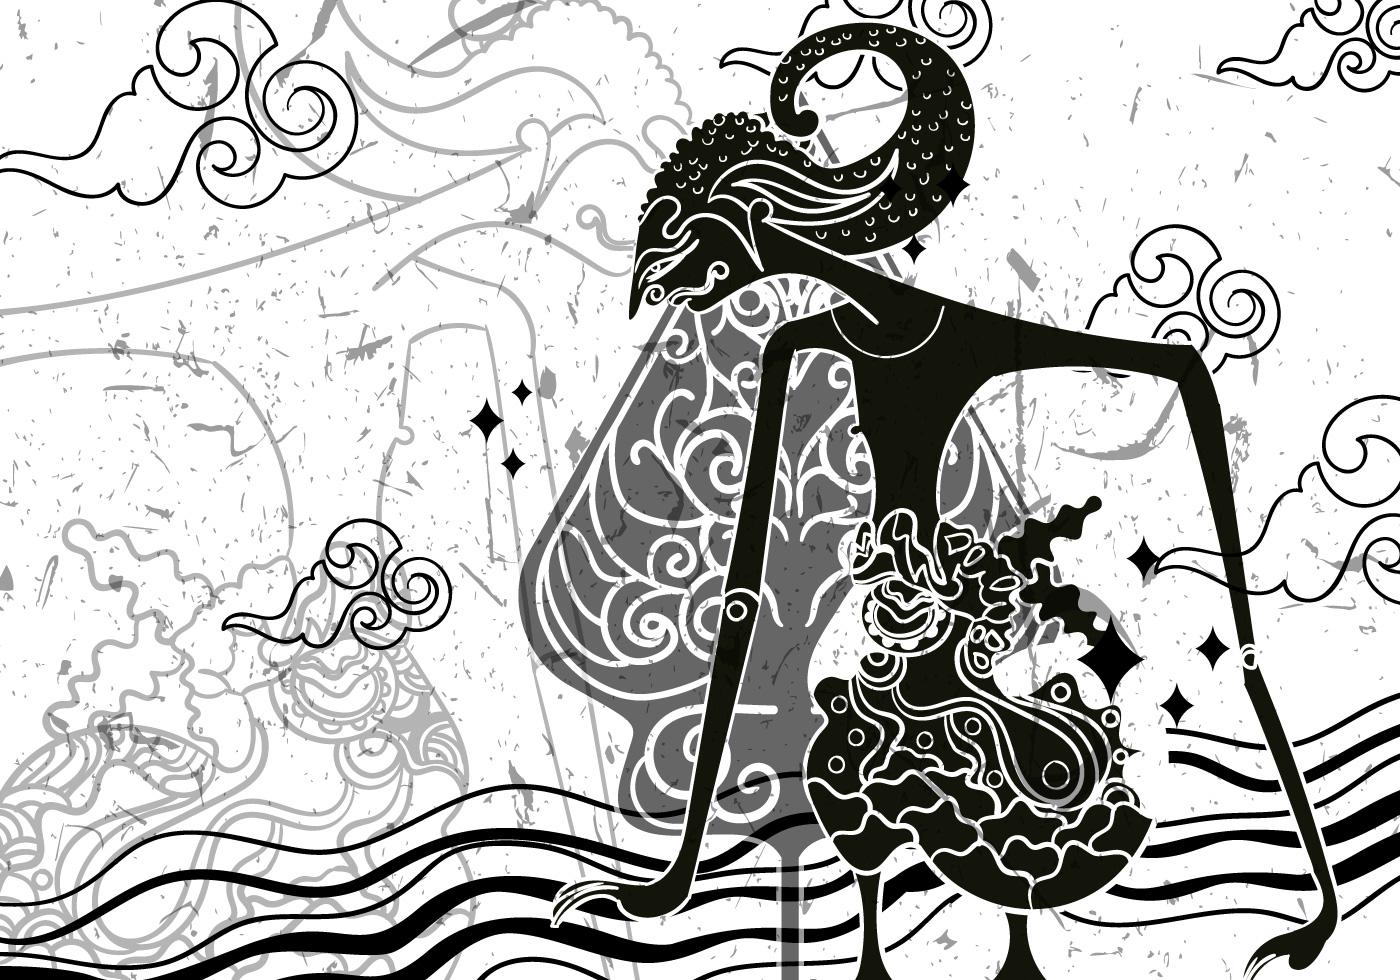 Wayang Gunungan Illustration